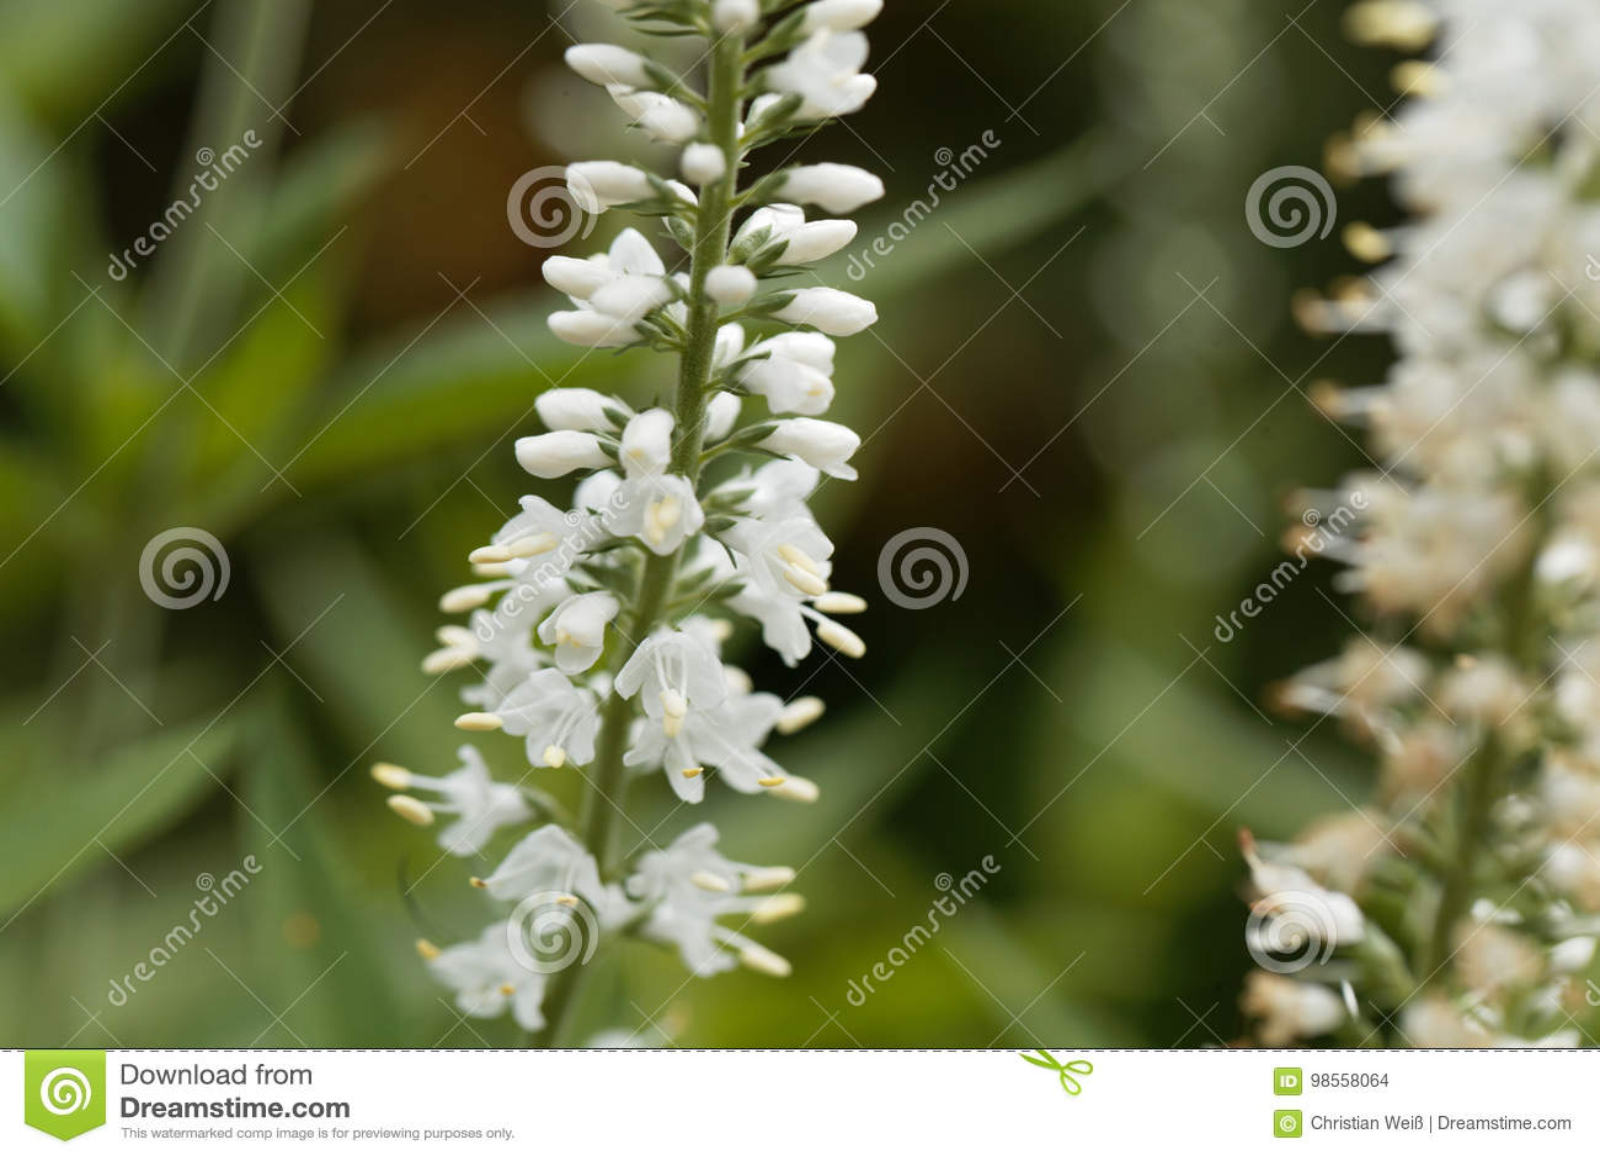 Вероника вайт цветы